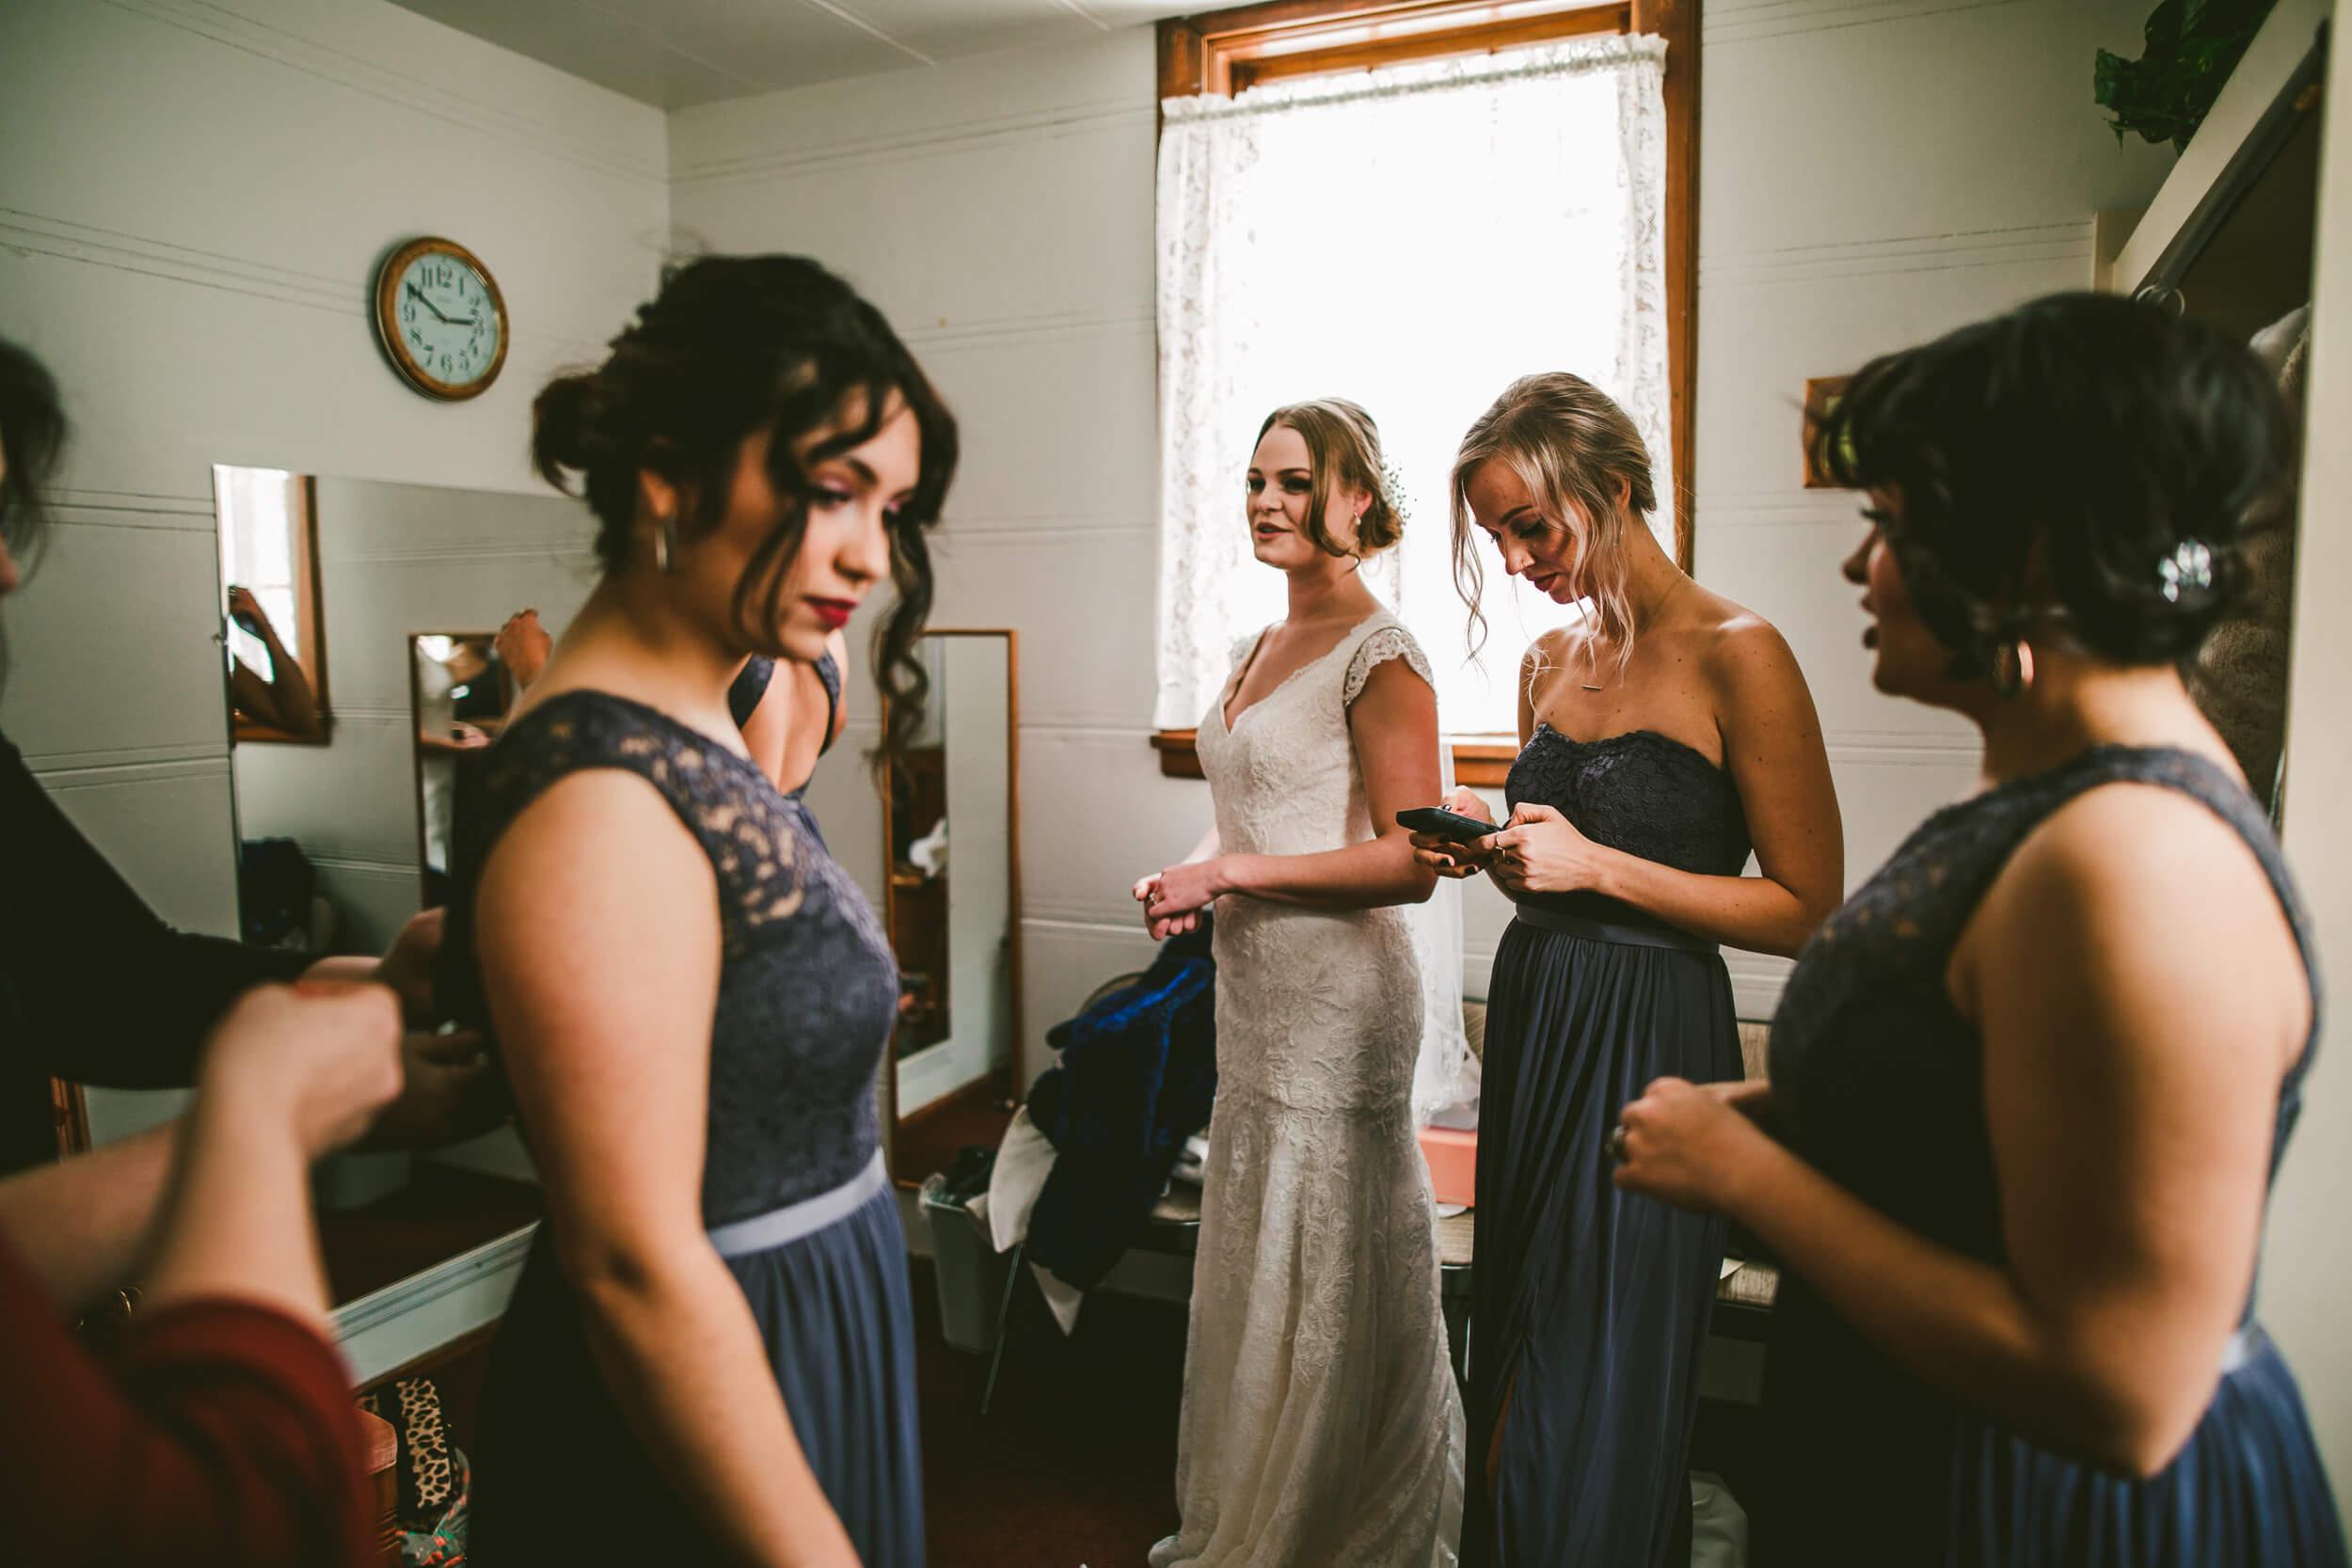 mukogawa winter wedding in spokane (32).jpg